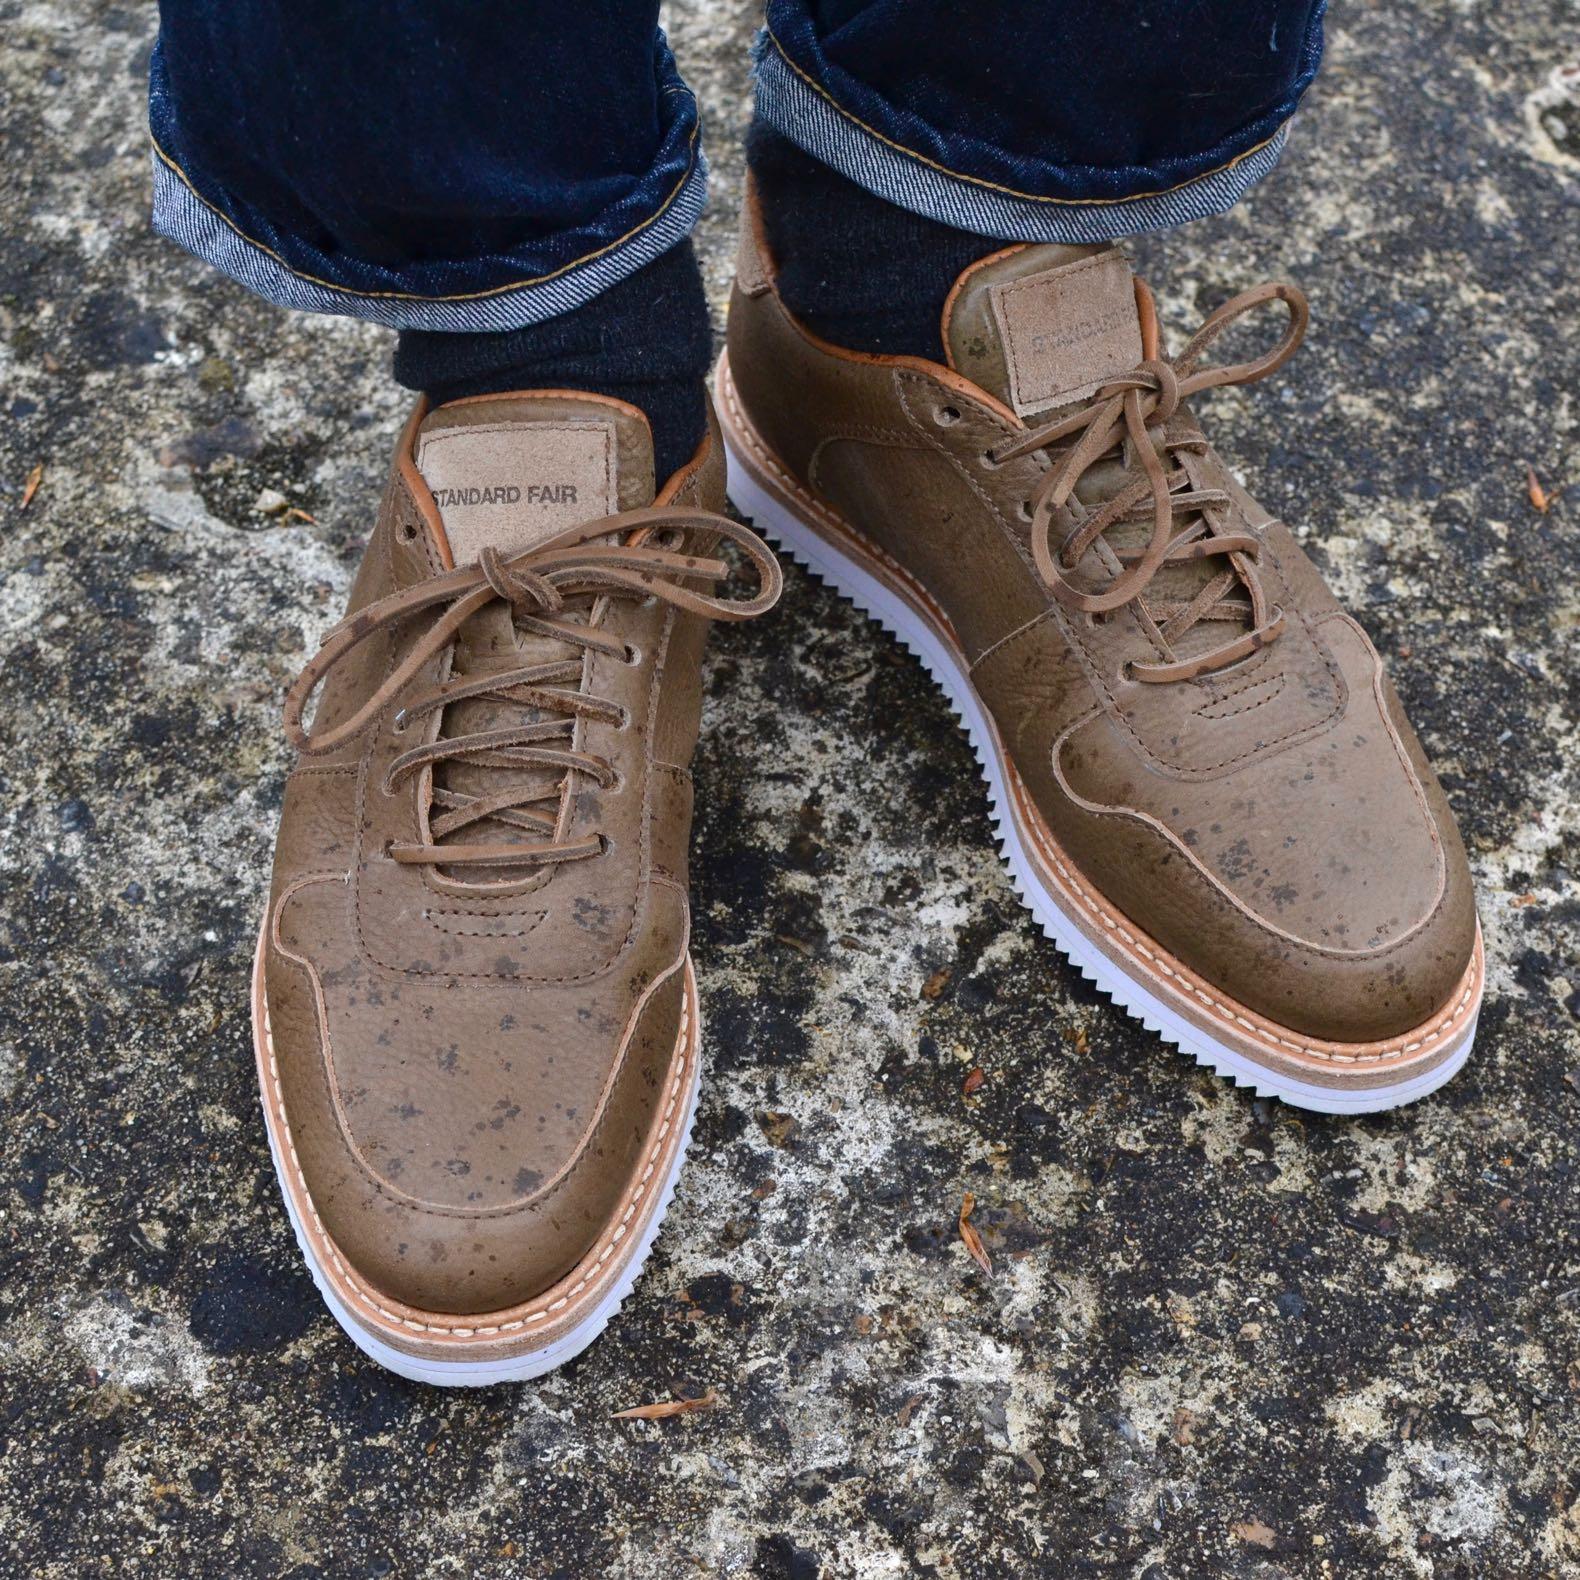 chaussure made in usa dans le maine standard fair